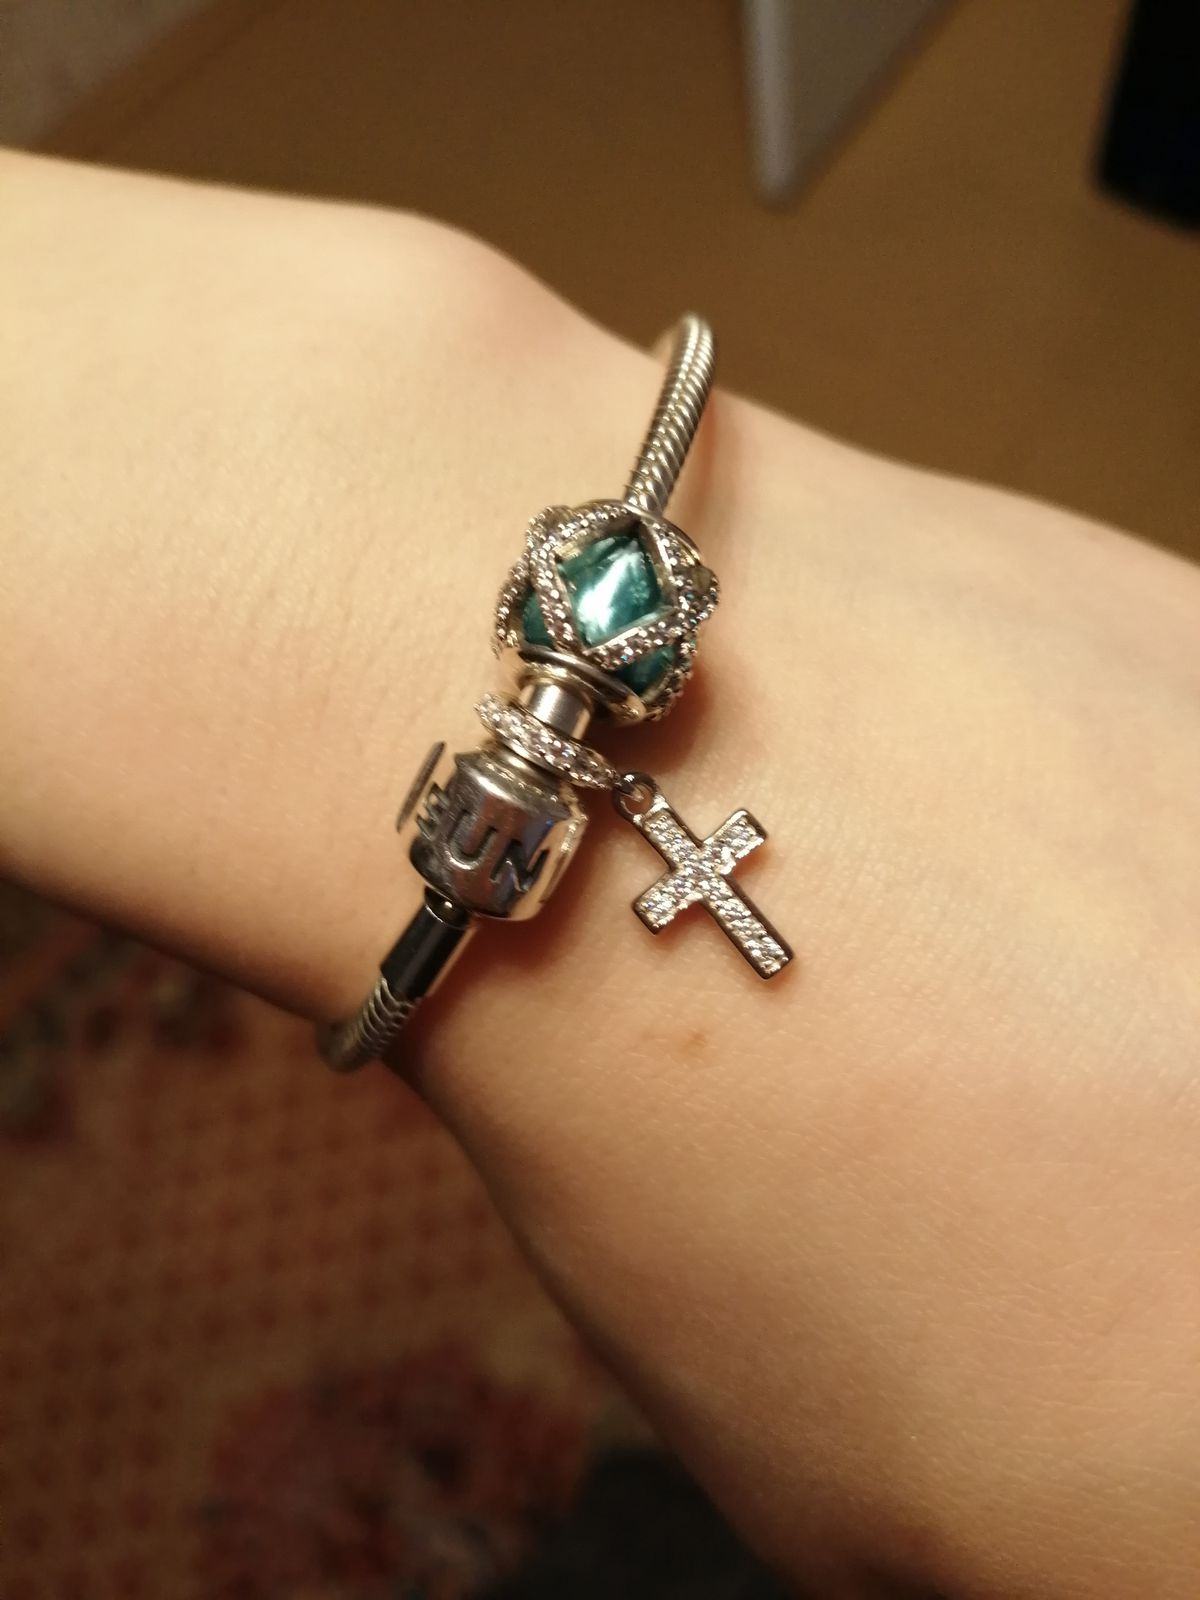 Обожаю кресты! Этот крестик идеален!